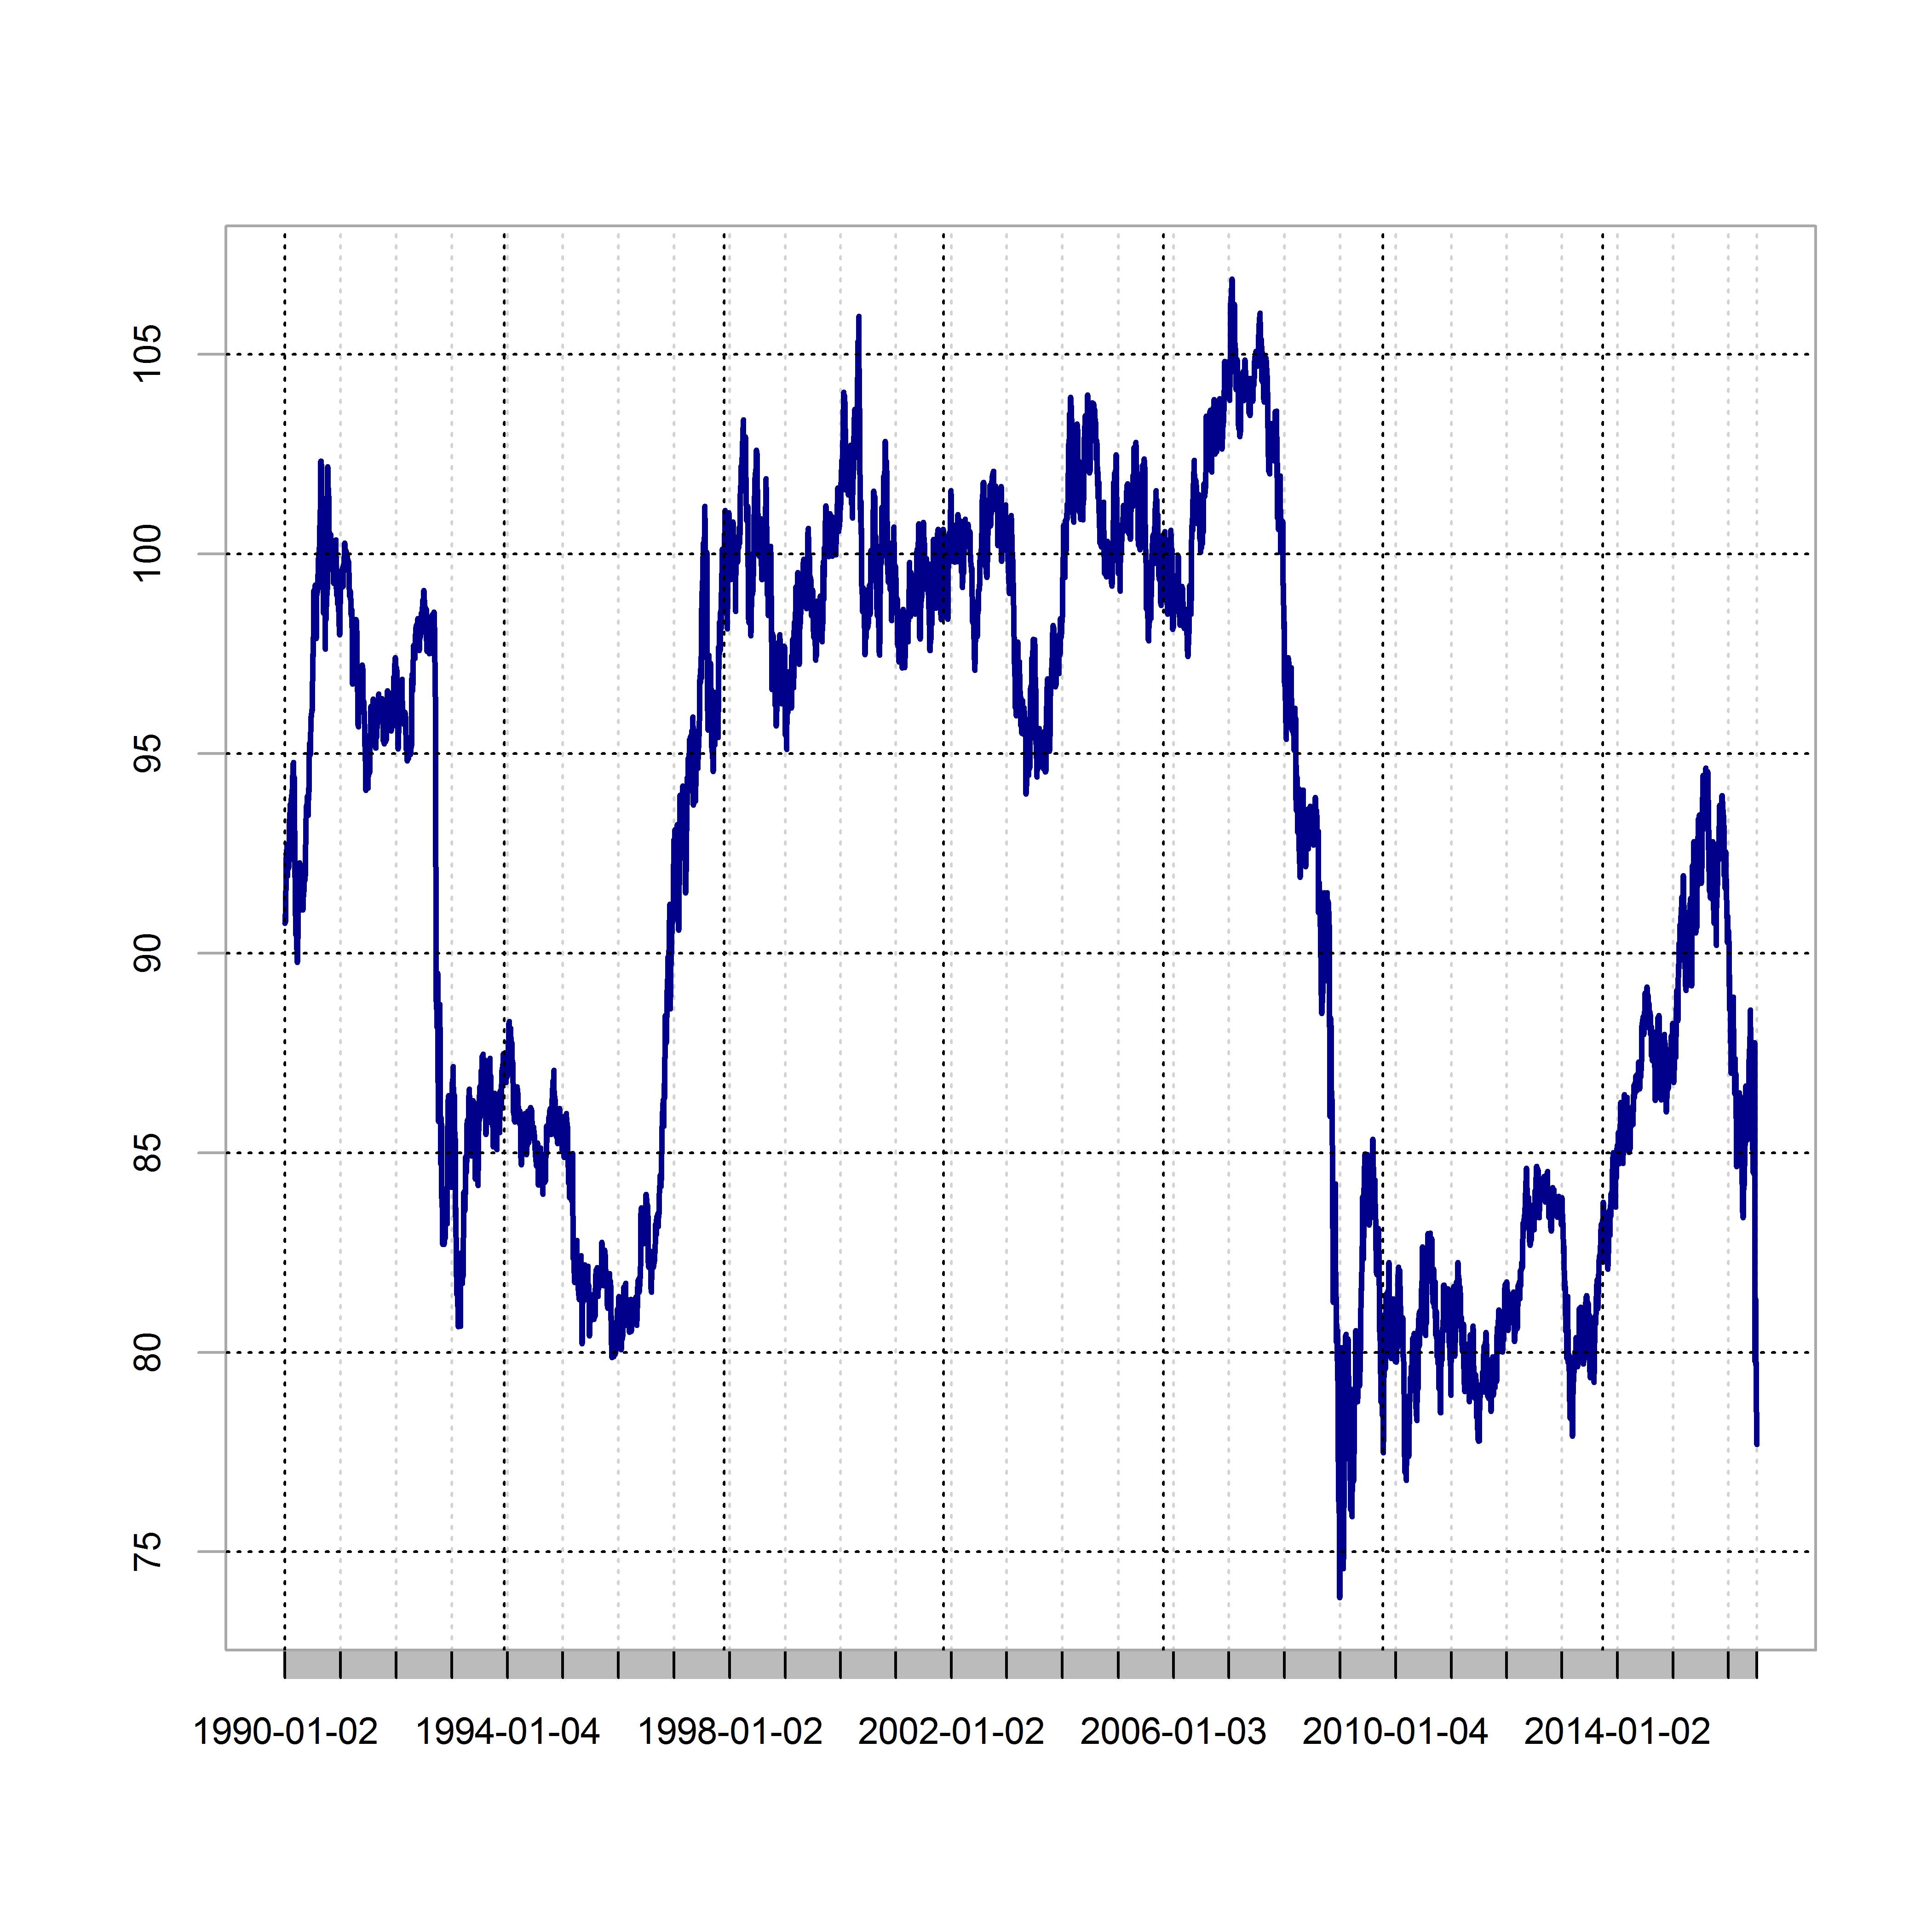 plot of chunk chartdata